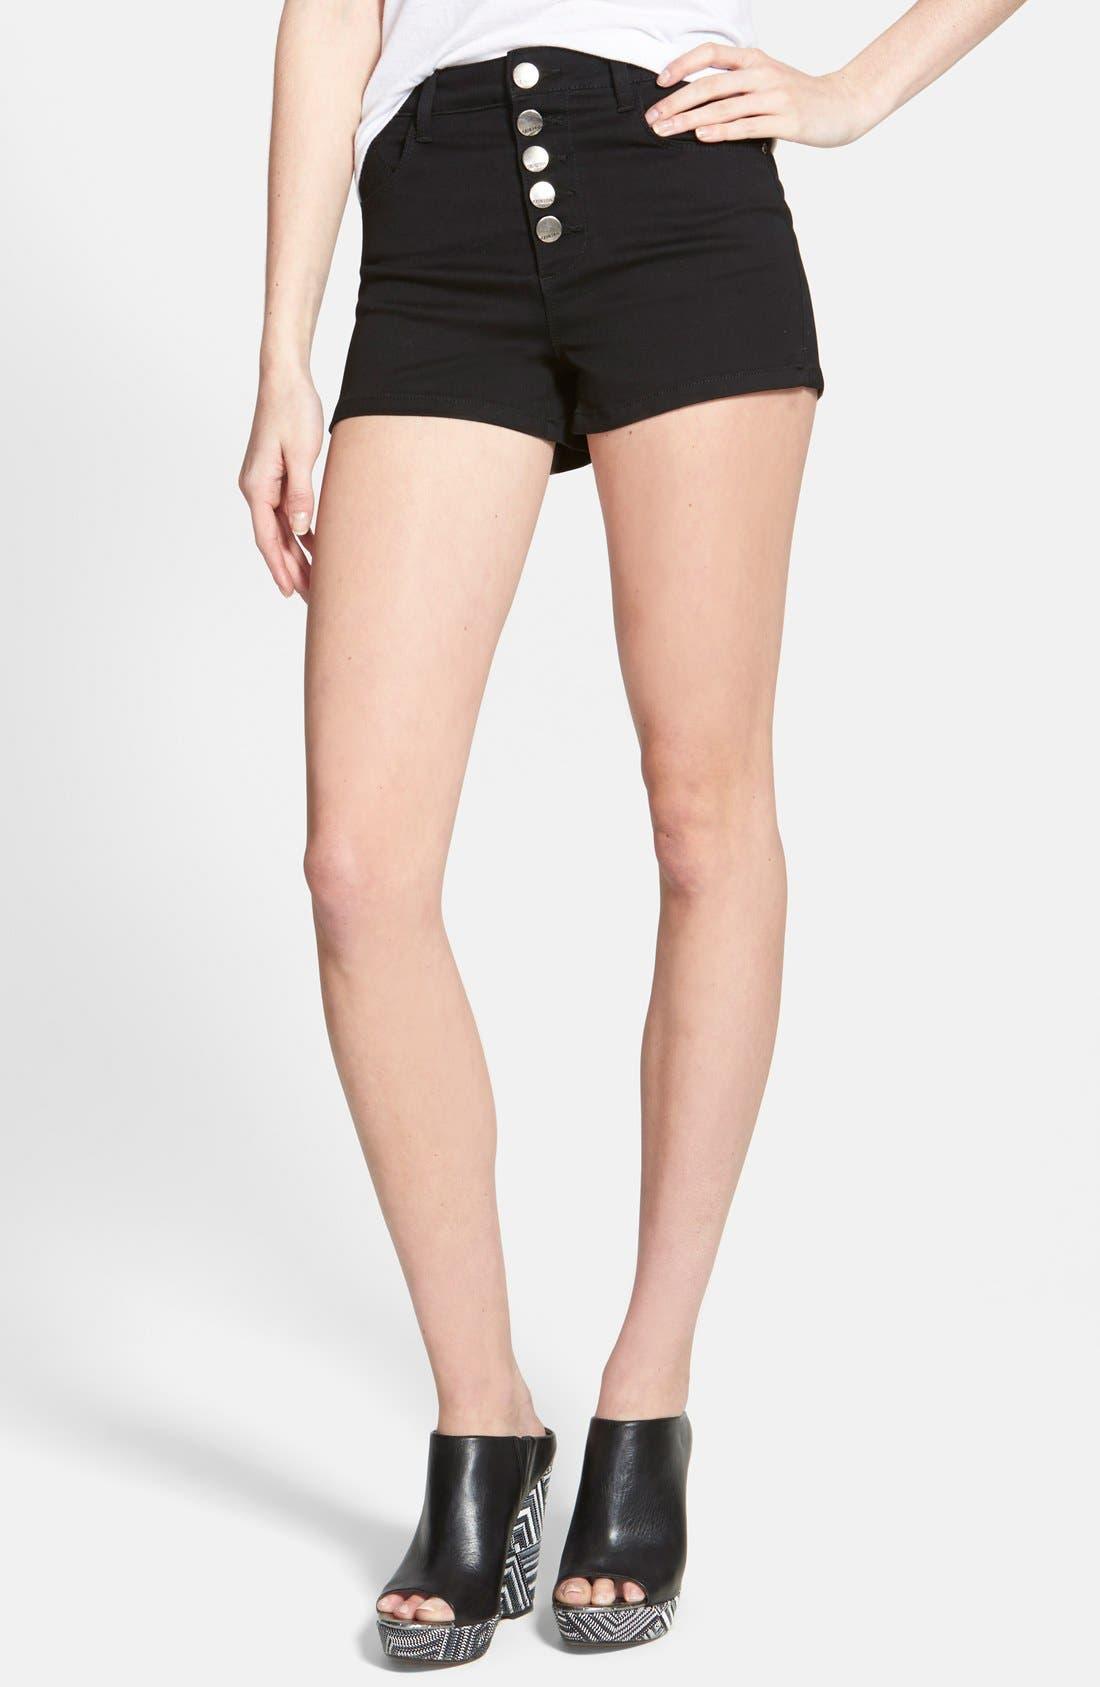 Alternate Image 1 Selected - Generra High Waist Button Front Shorts (Juniors)